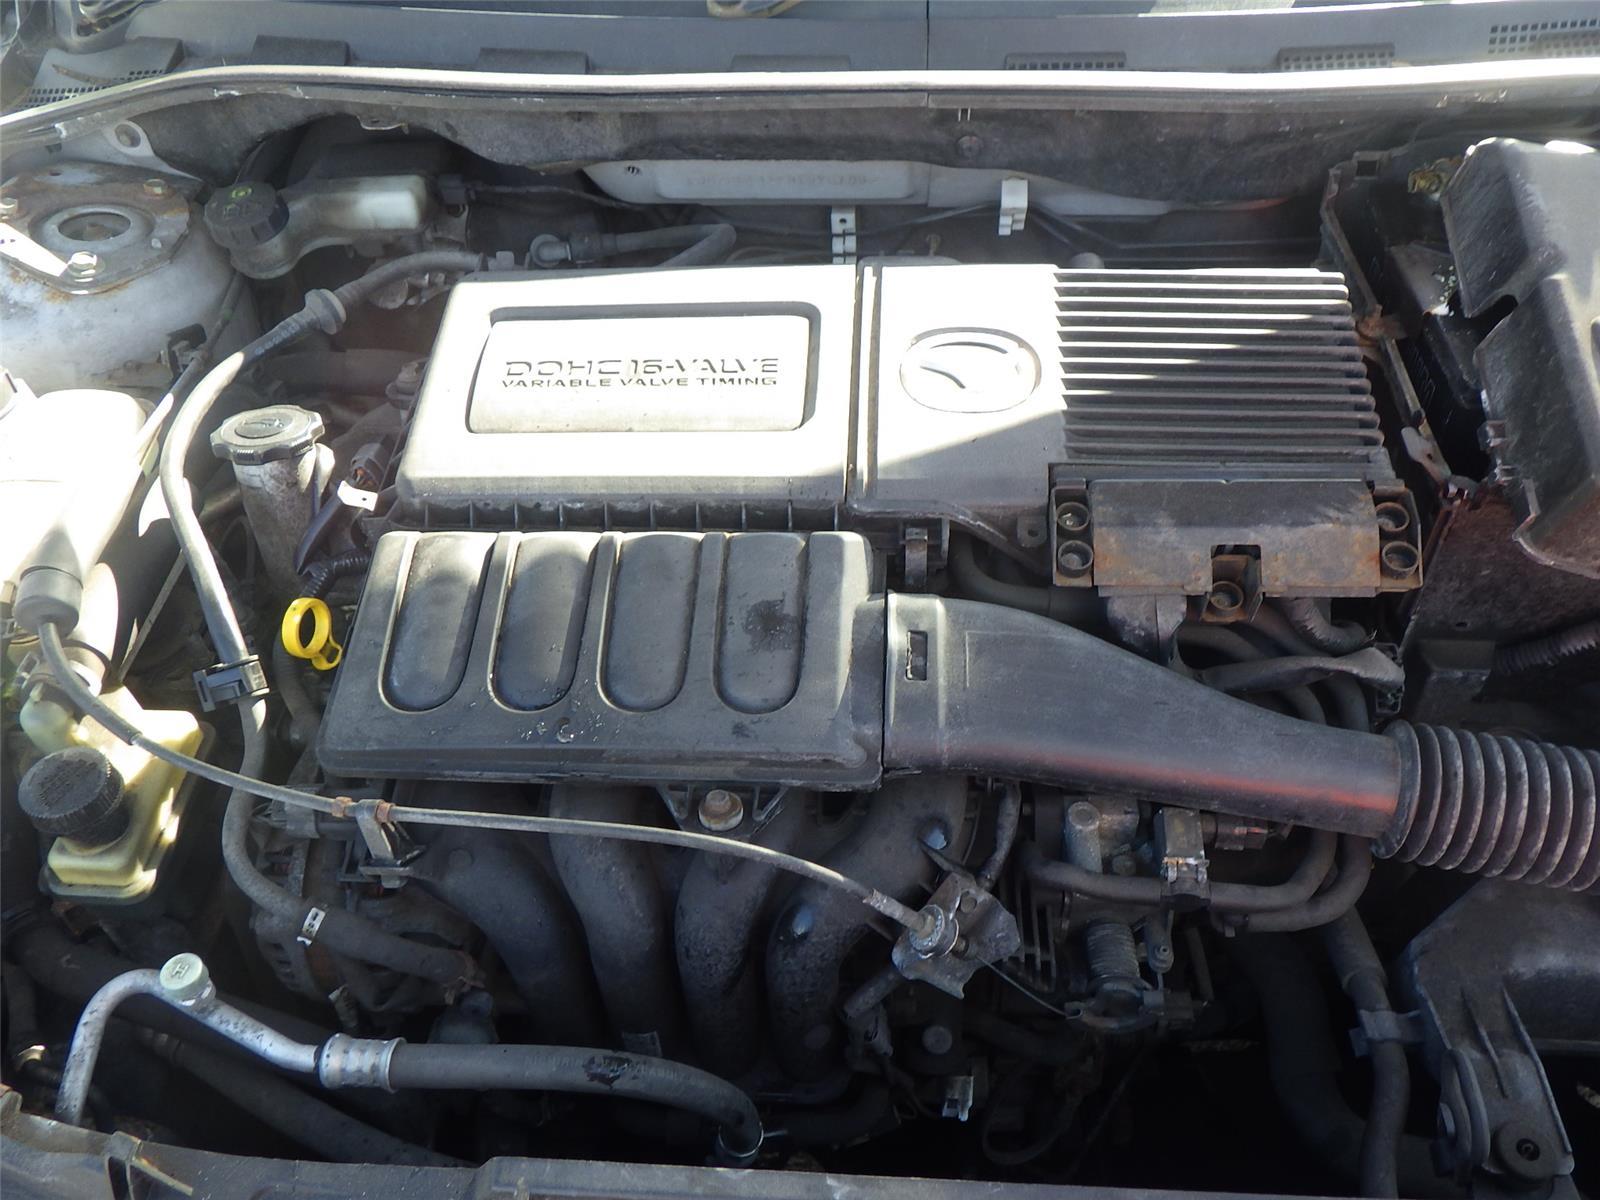 2006 Mazda 3 2004 To 2008 5 Door Hatchback Petrol Manual Engine Parts Diagram